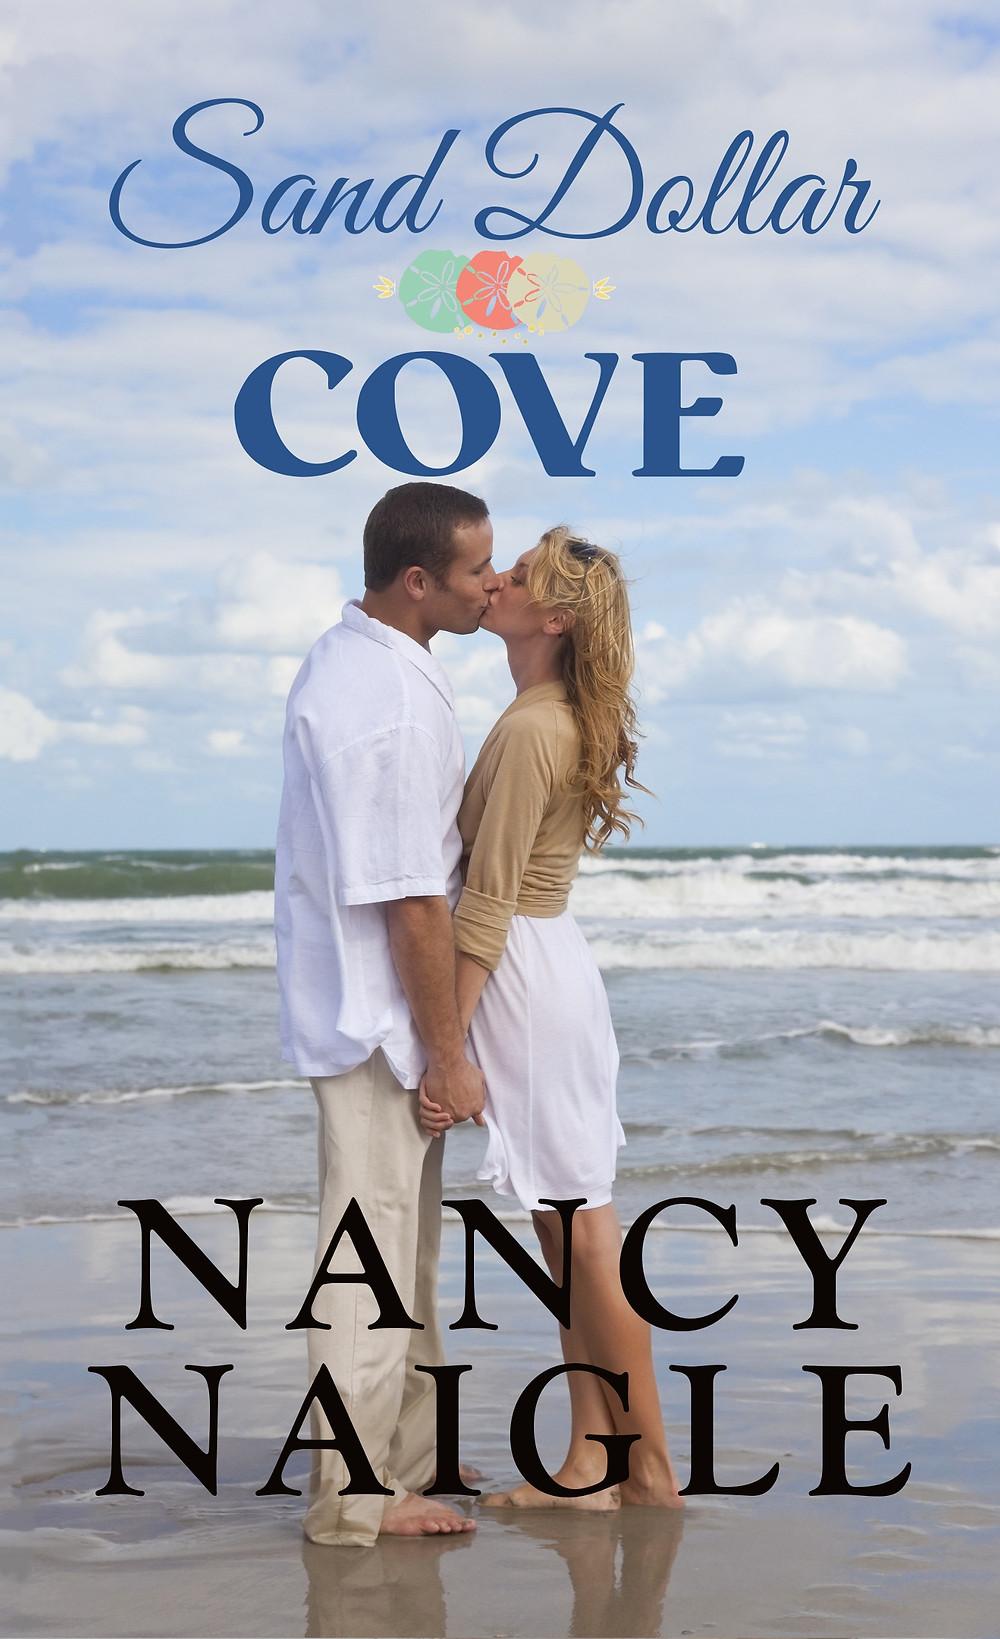 Sand Dollar Cove, Nancy Naigle